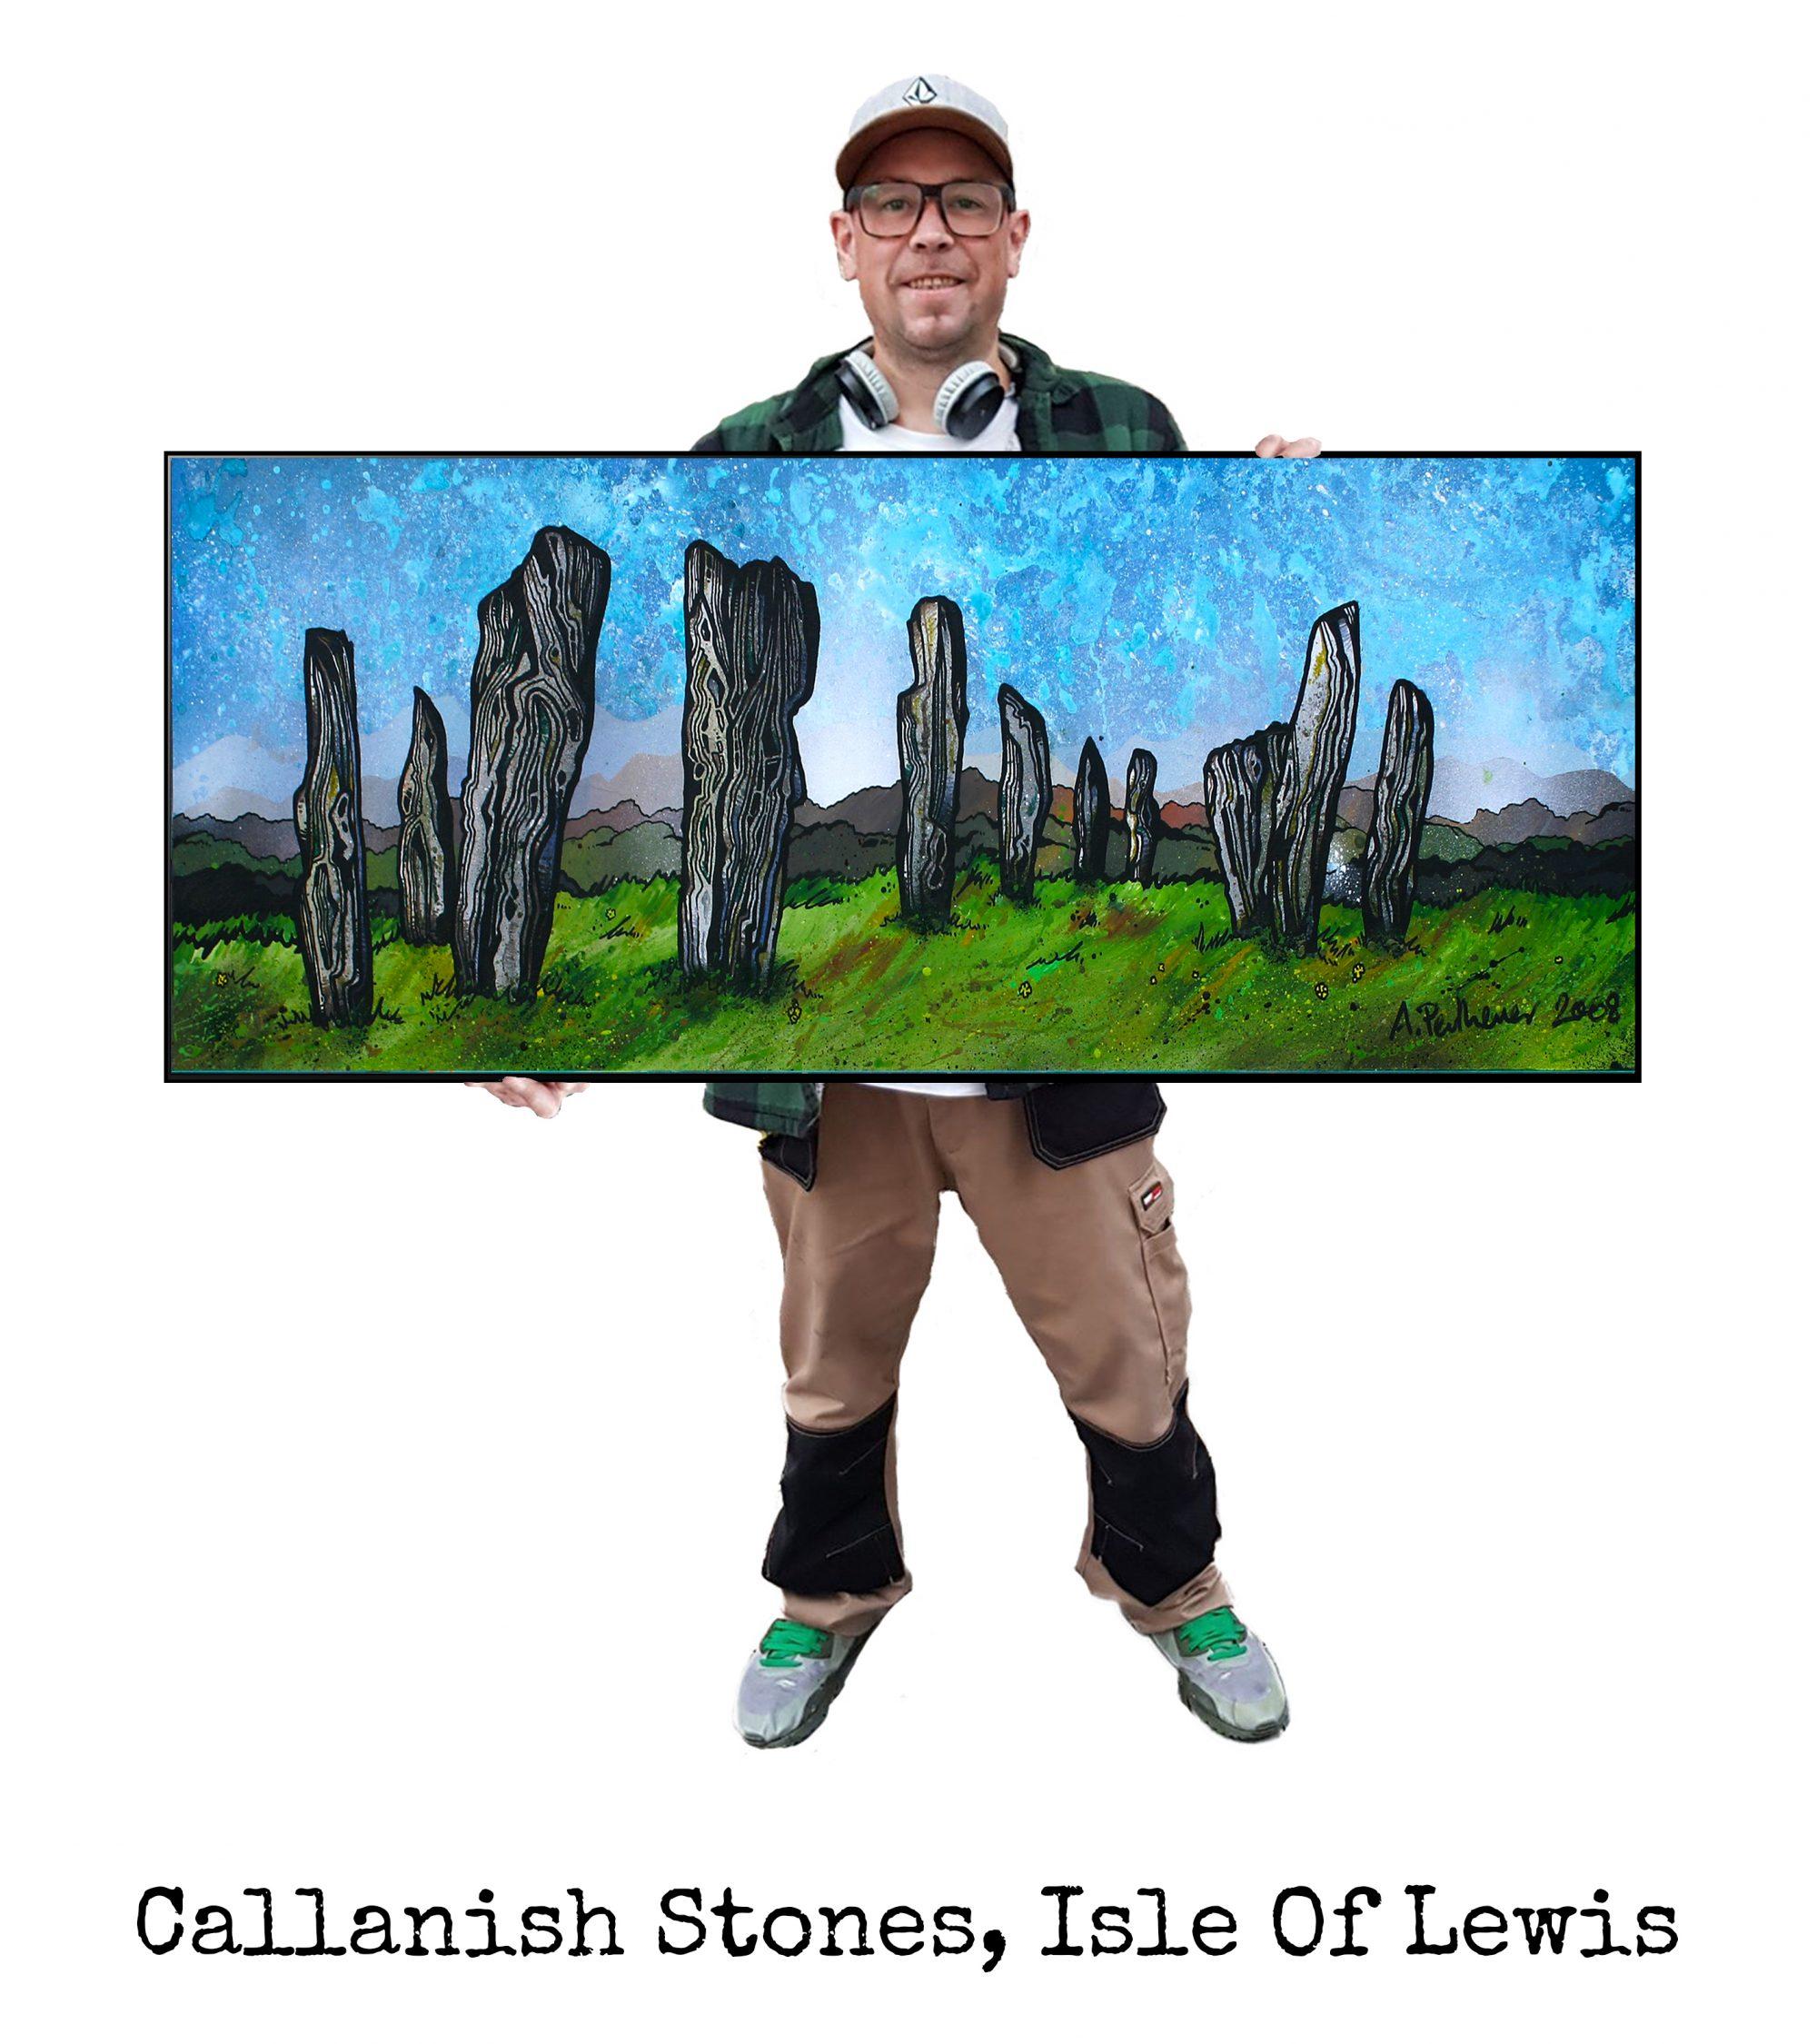 Callanish Stones. lewis - Original Painting & Various Print Formats